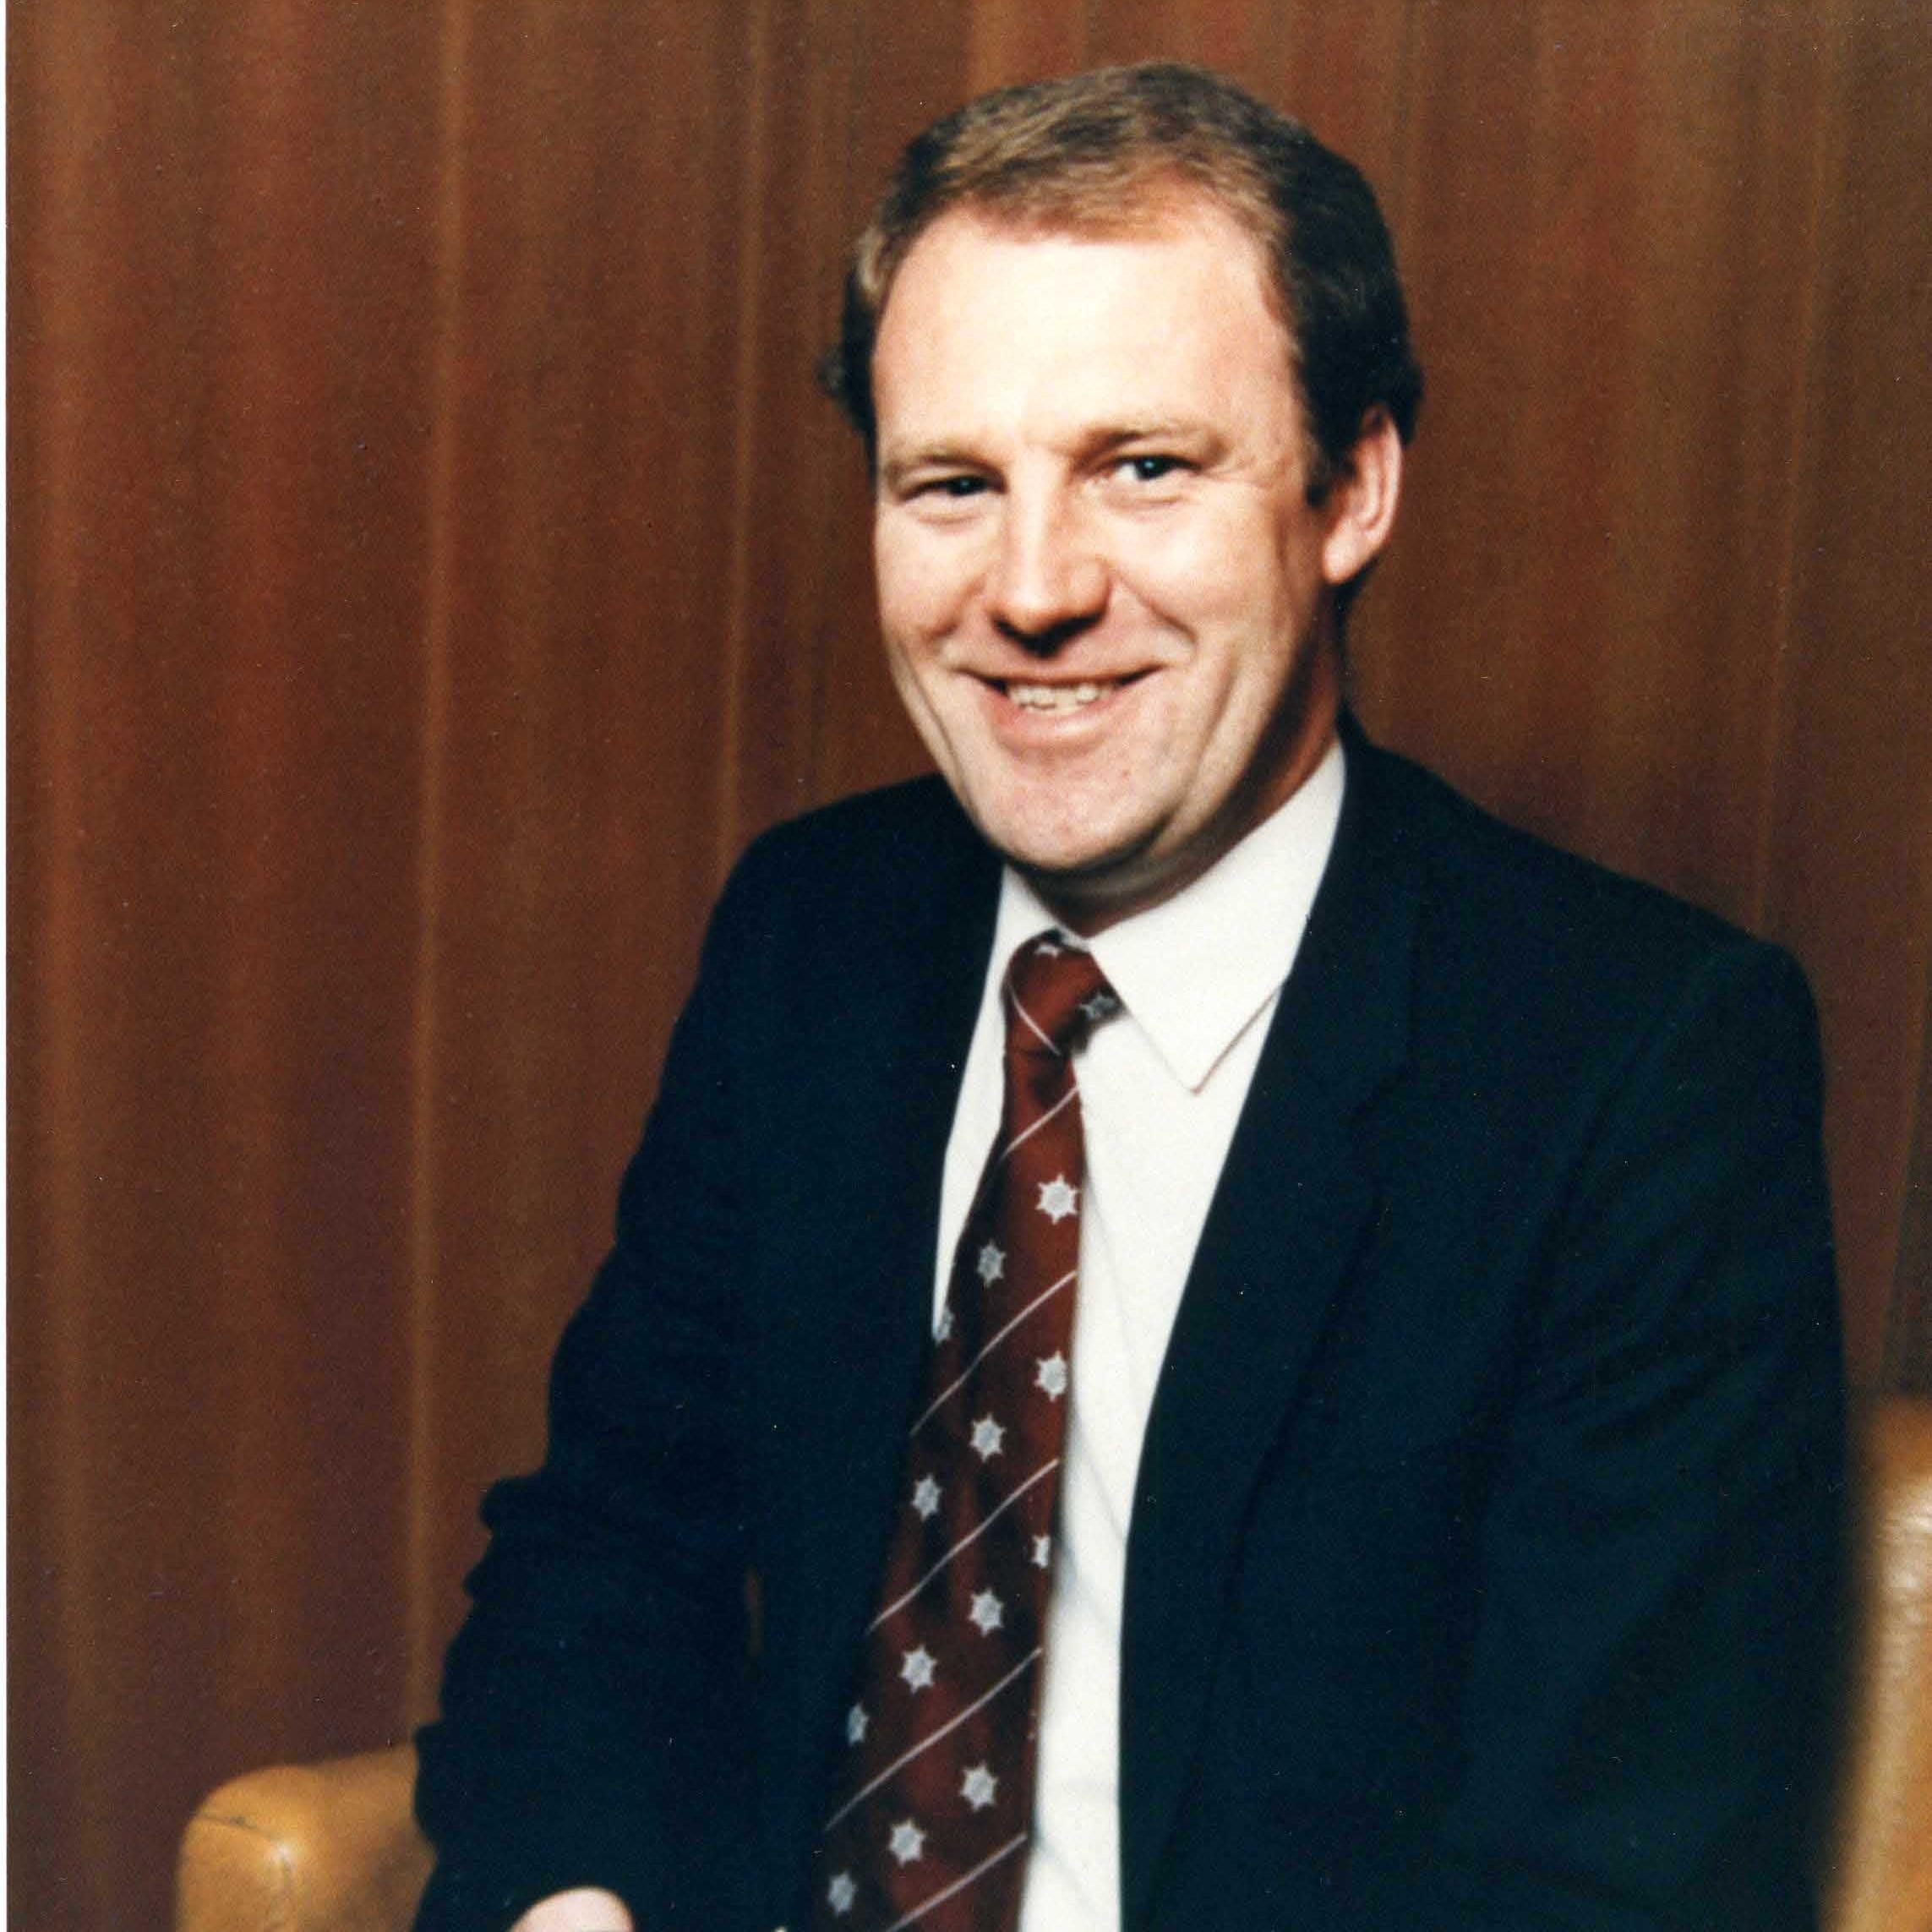 D Millar - 1983-1985